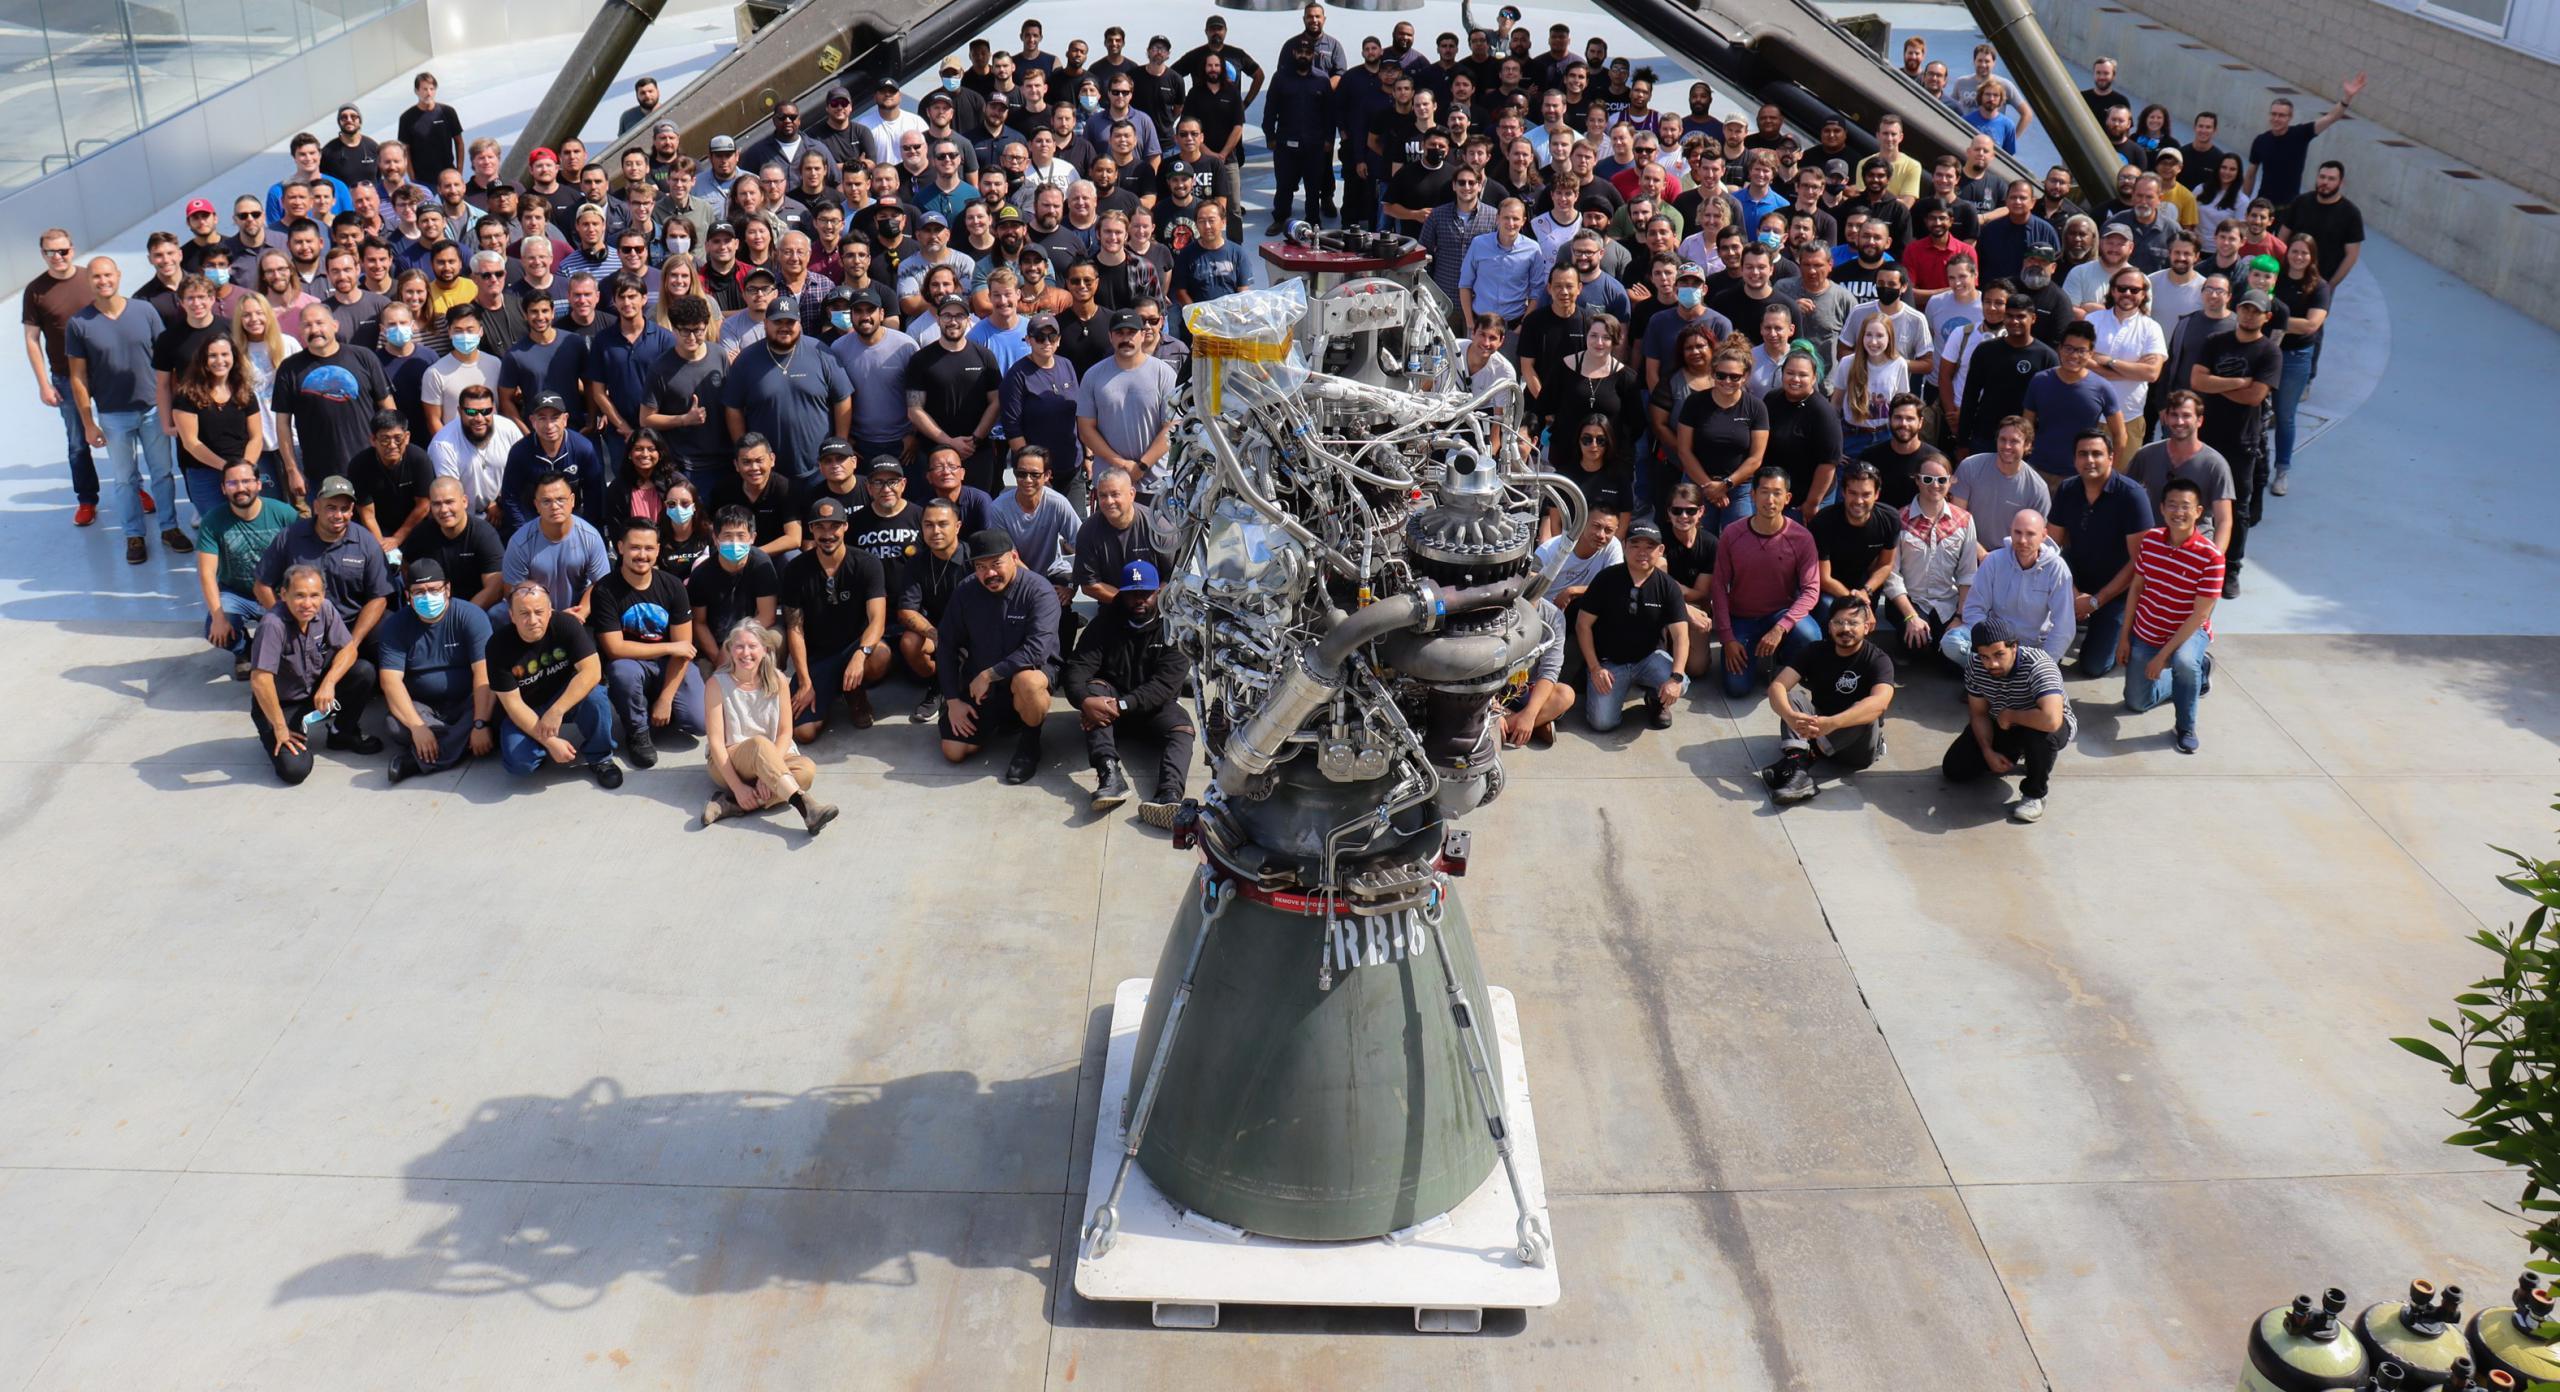 RB16 100th Raptor build Hawthorne 072621 (SpaceX) 1 crop (c)